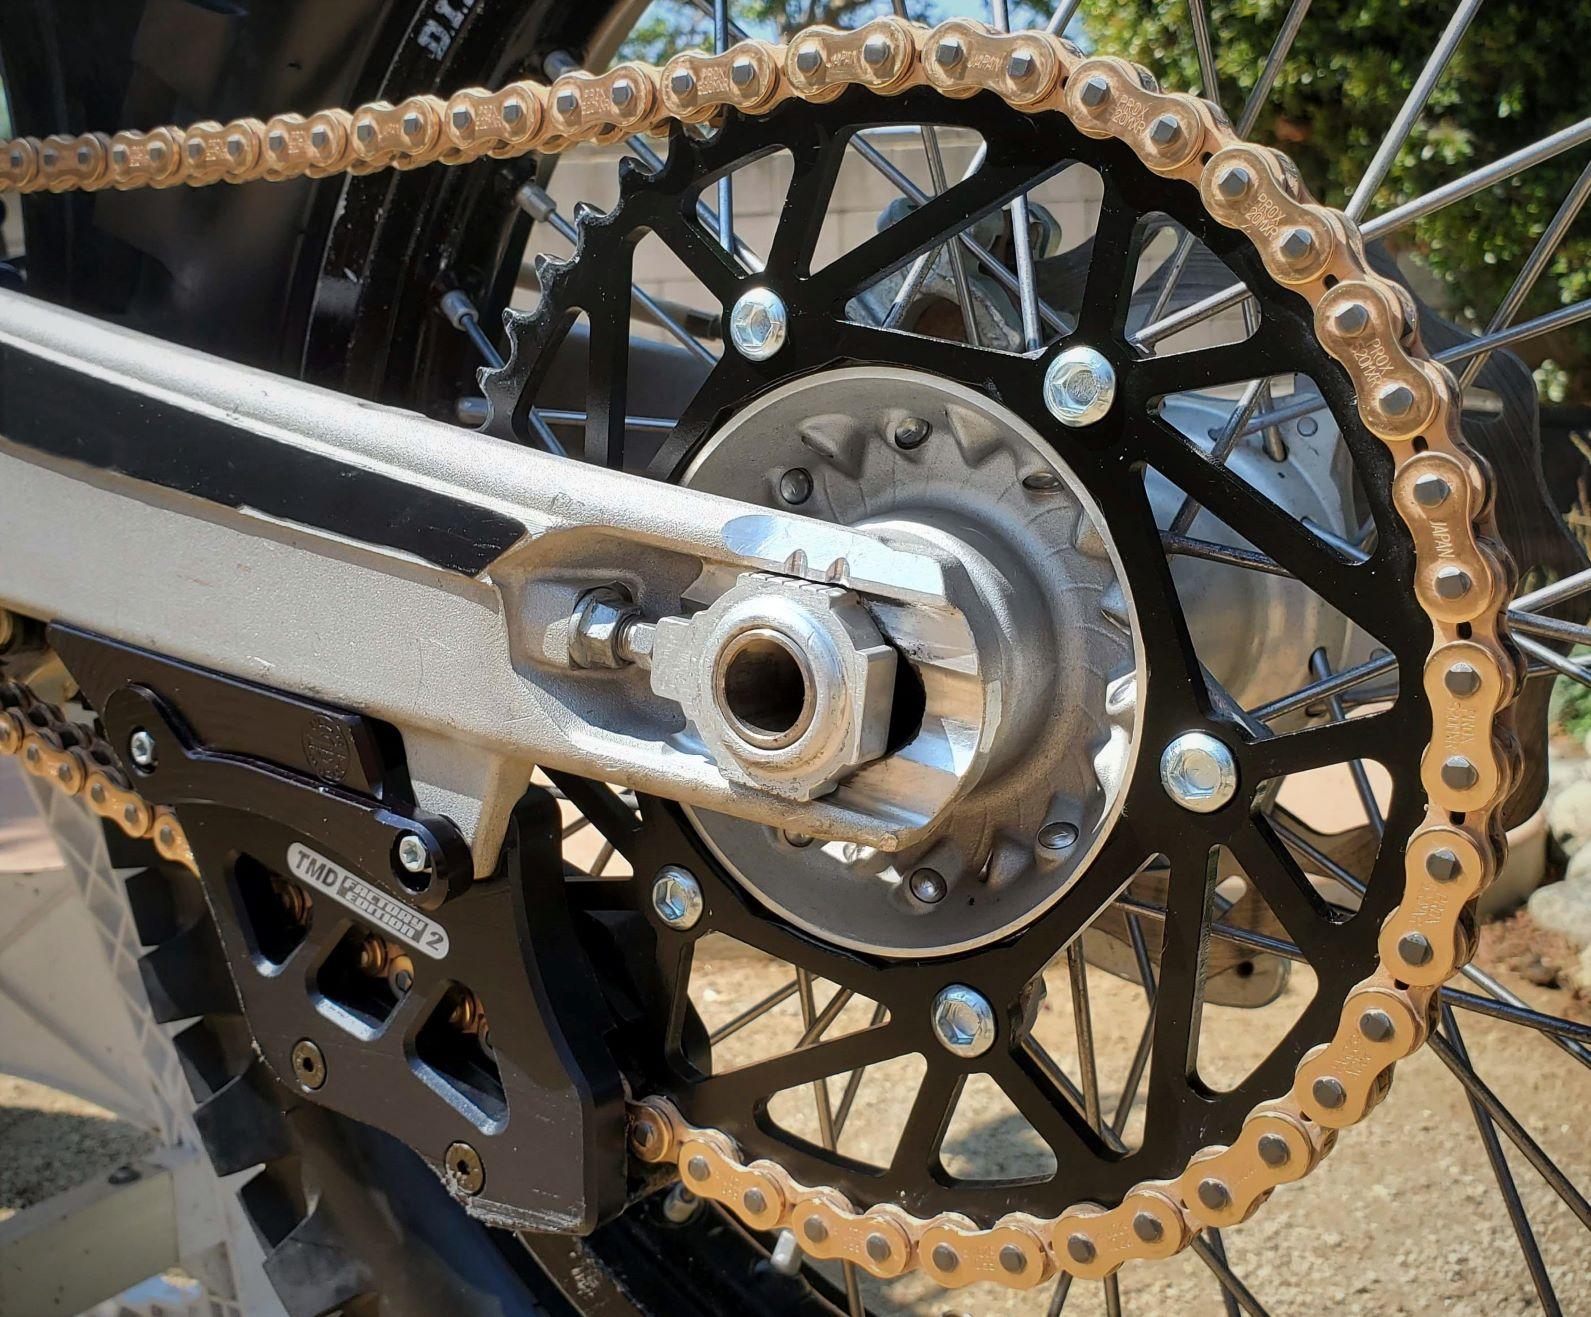 211005 ProX Ultralight Sprocket on Bike_rs